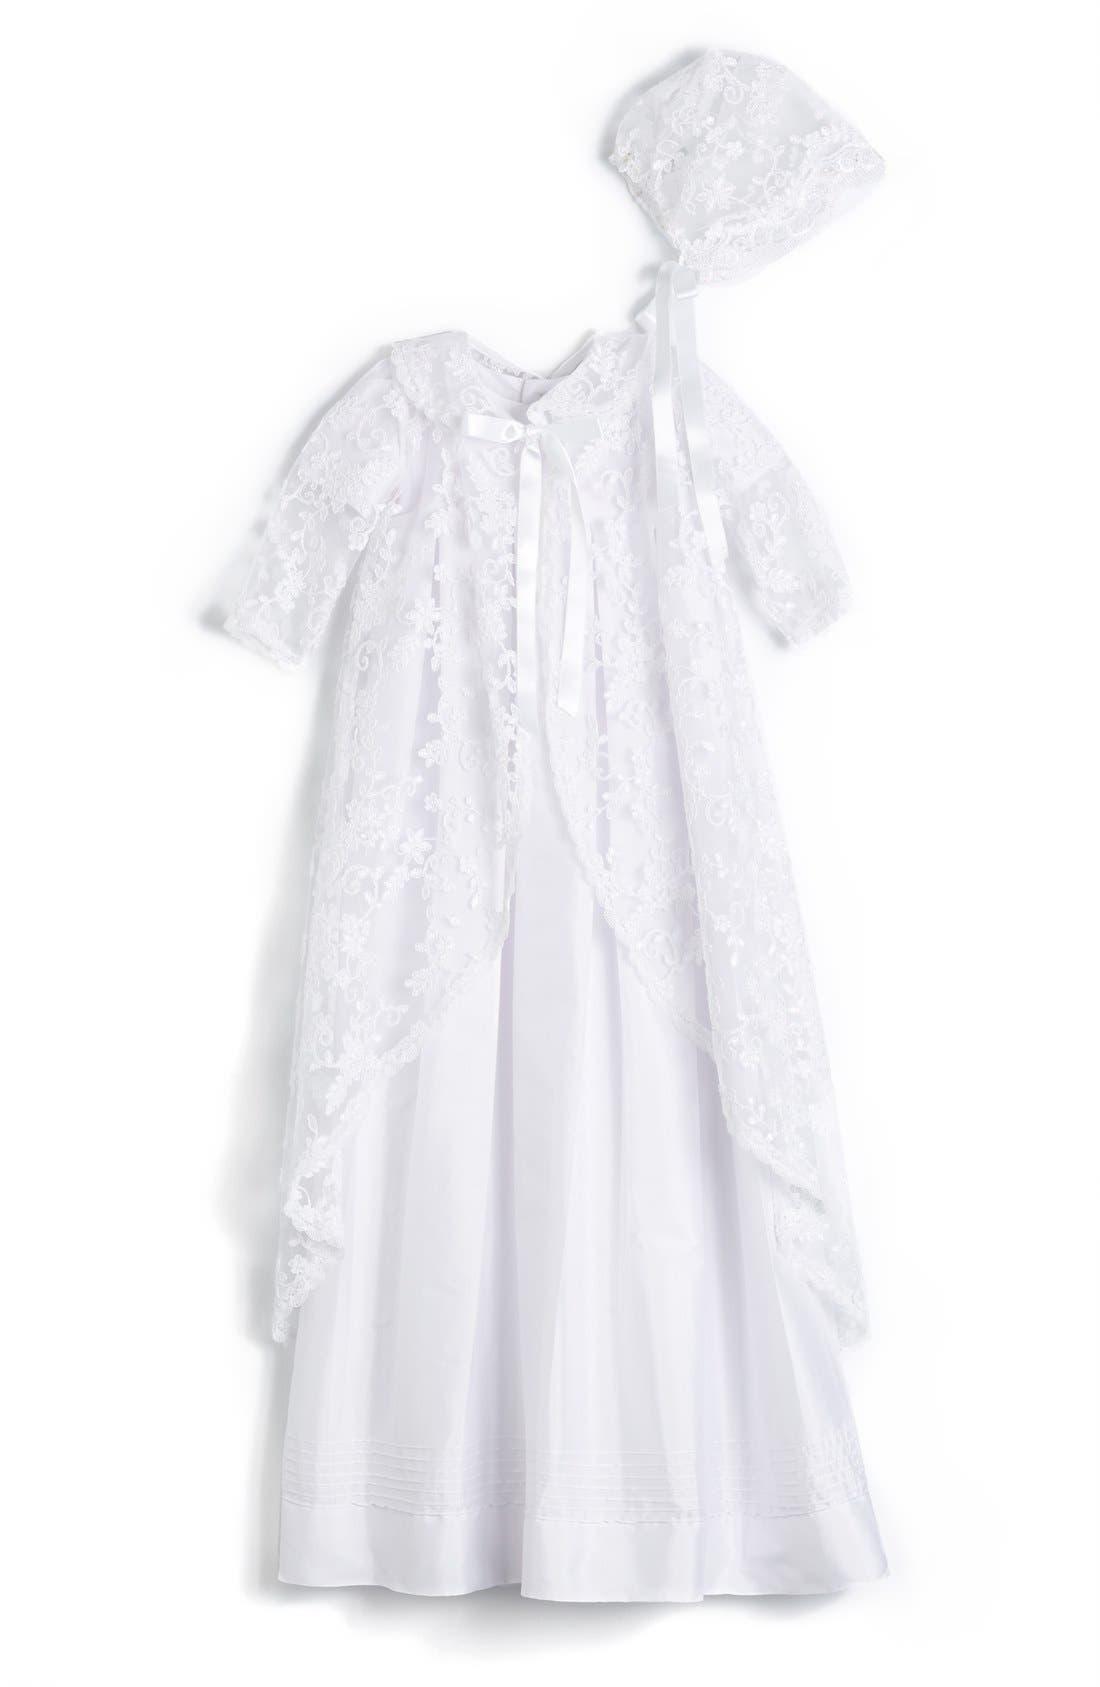 Alternate Image 1 Selected - Isabel Garreton 'Renaissance' Christening Gown & Bonnet (Baby)